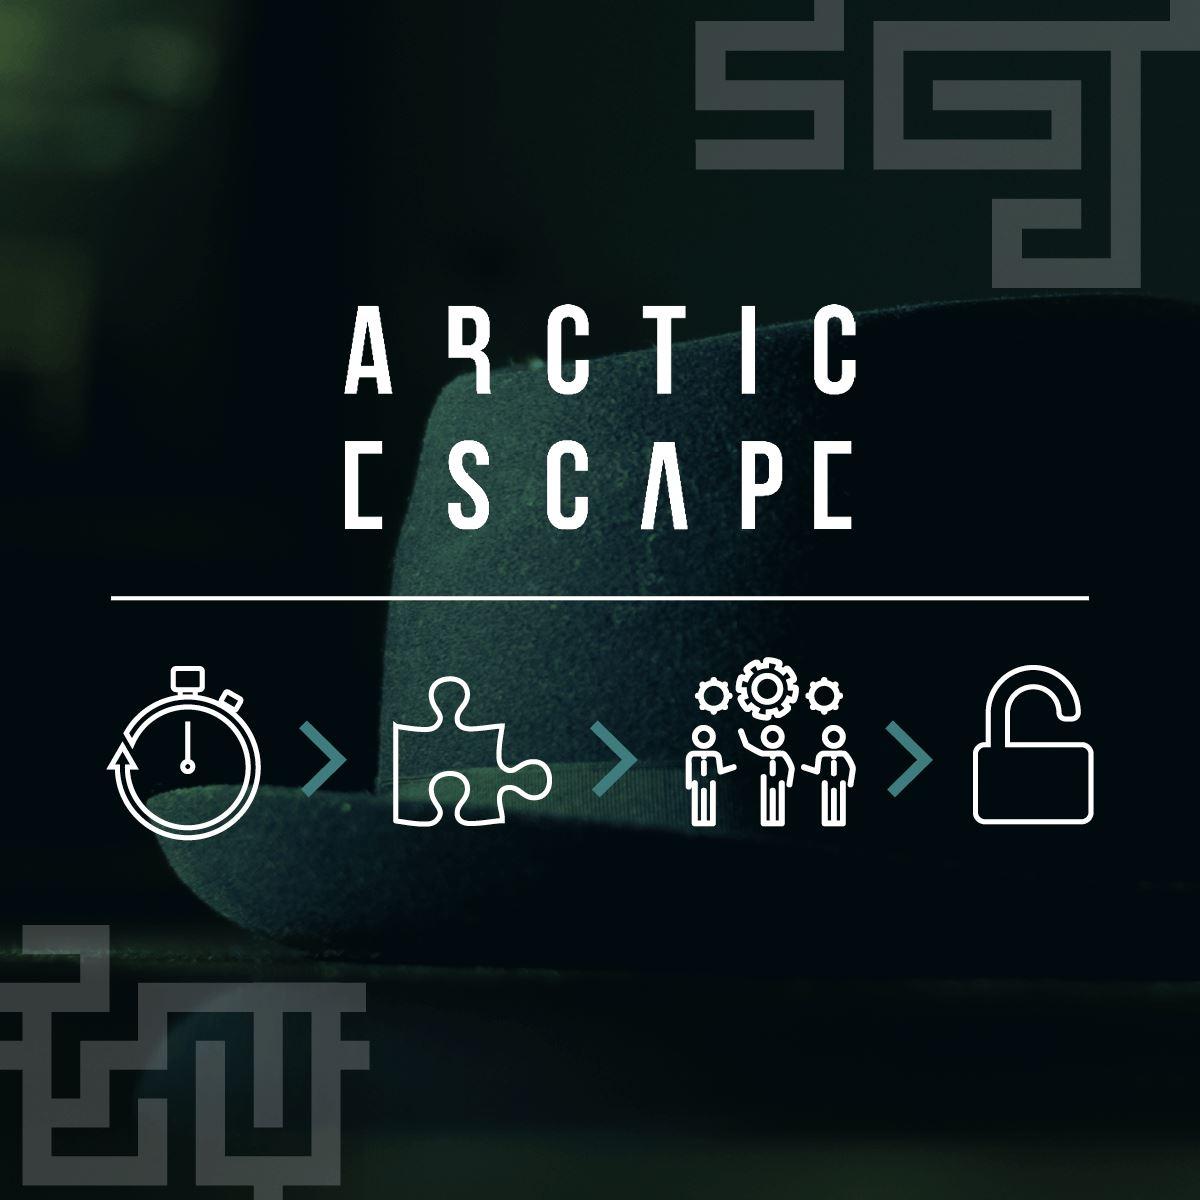 Arctic Escape – Verdens nordligste escape room